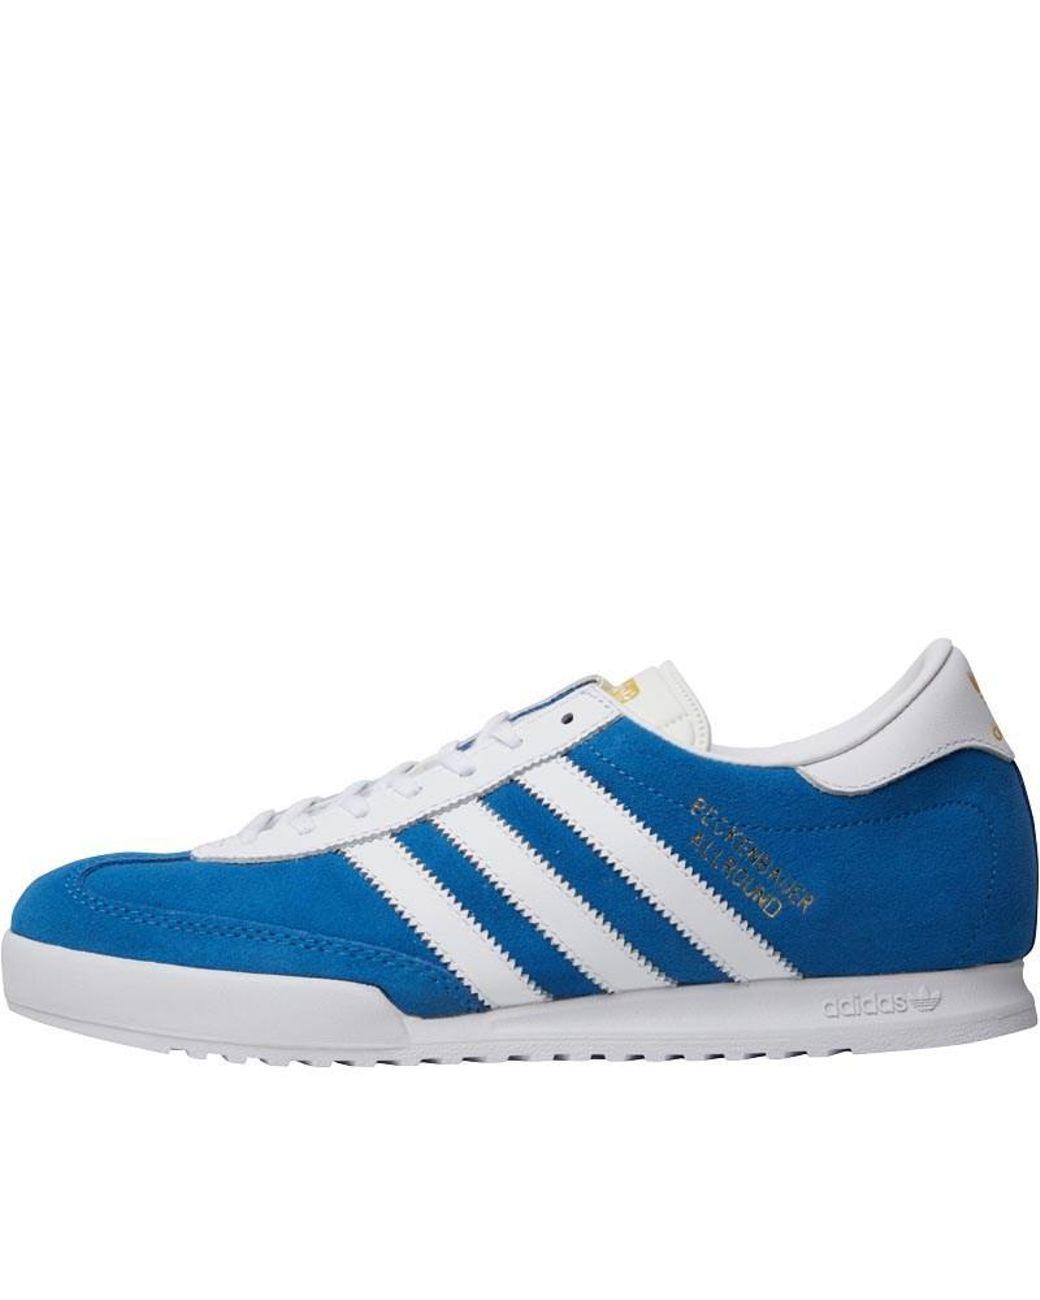 official photos 26f23 0fe04 Adidas Originals - Beckenbauer All Round Trainers Bluebird white metallic  Gold for Men -